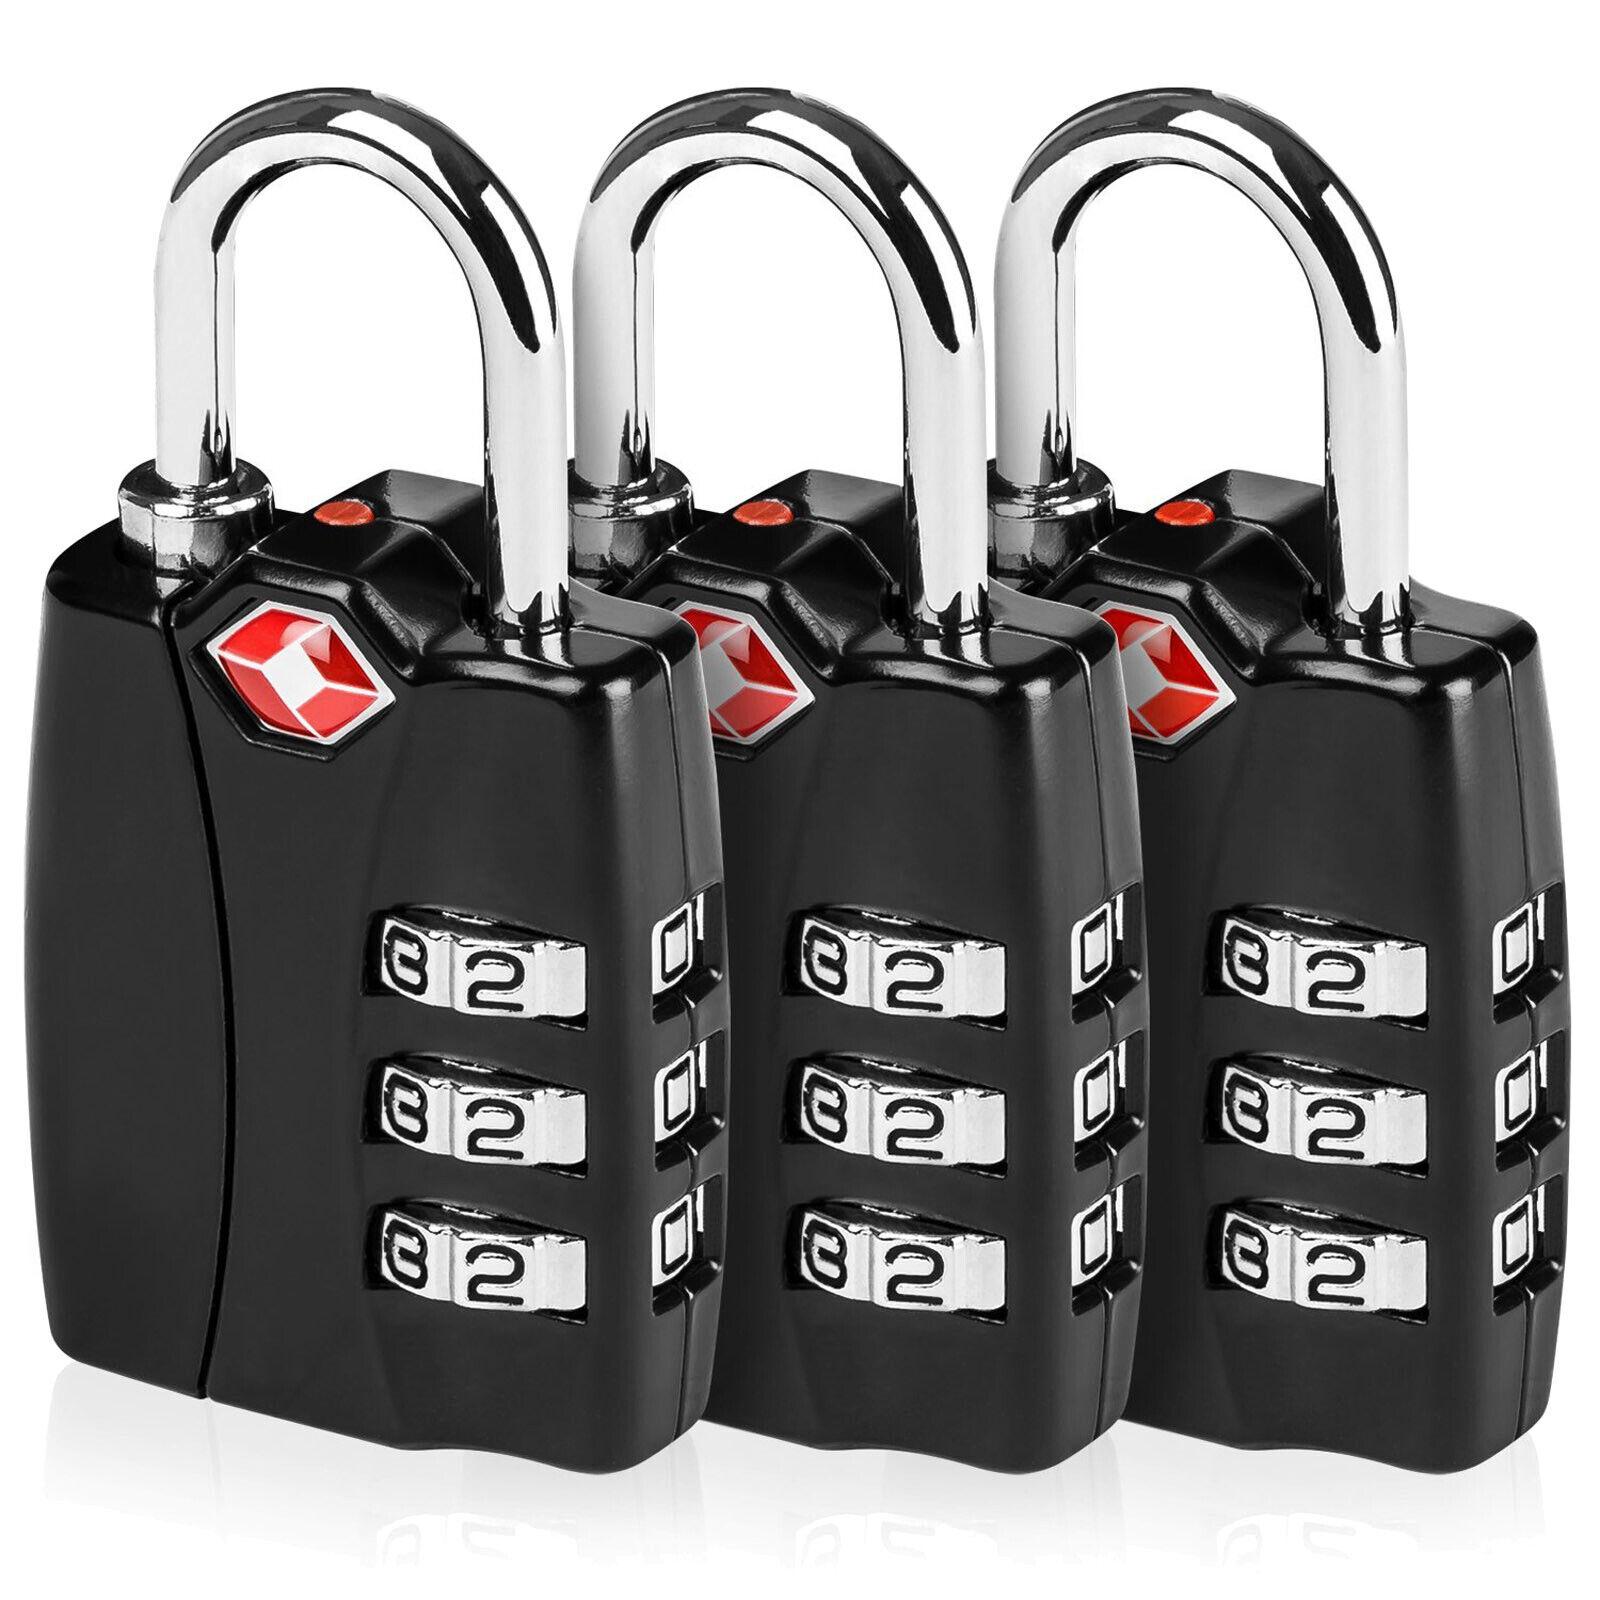 Zinc TSA Luggage Locks 3 Digit Combination Steel Padlocks Approved Travel Lock - $10.44